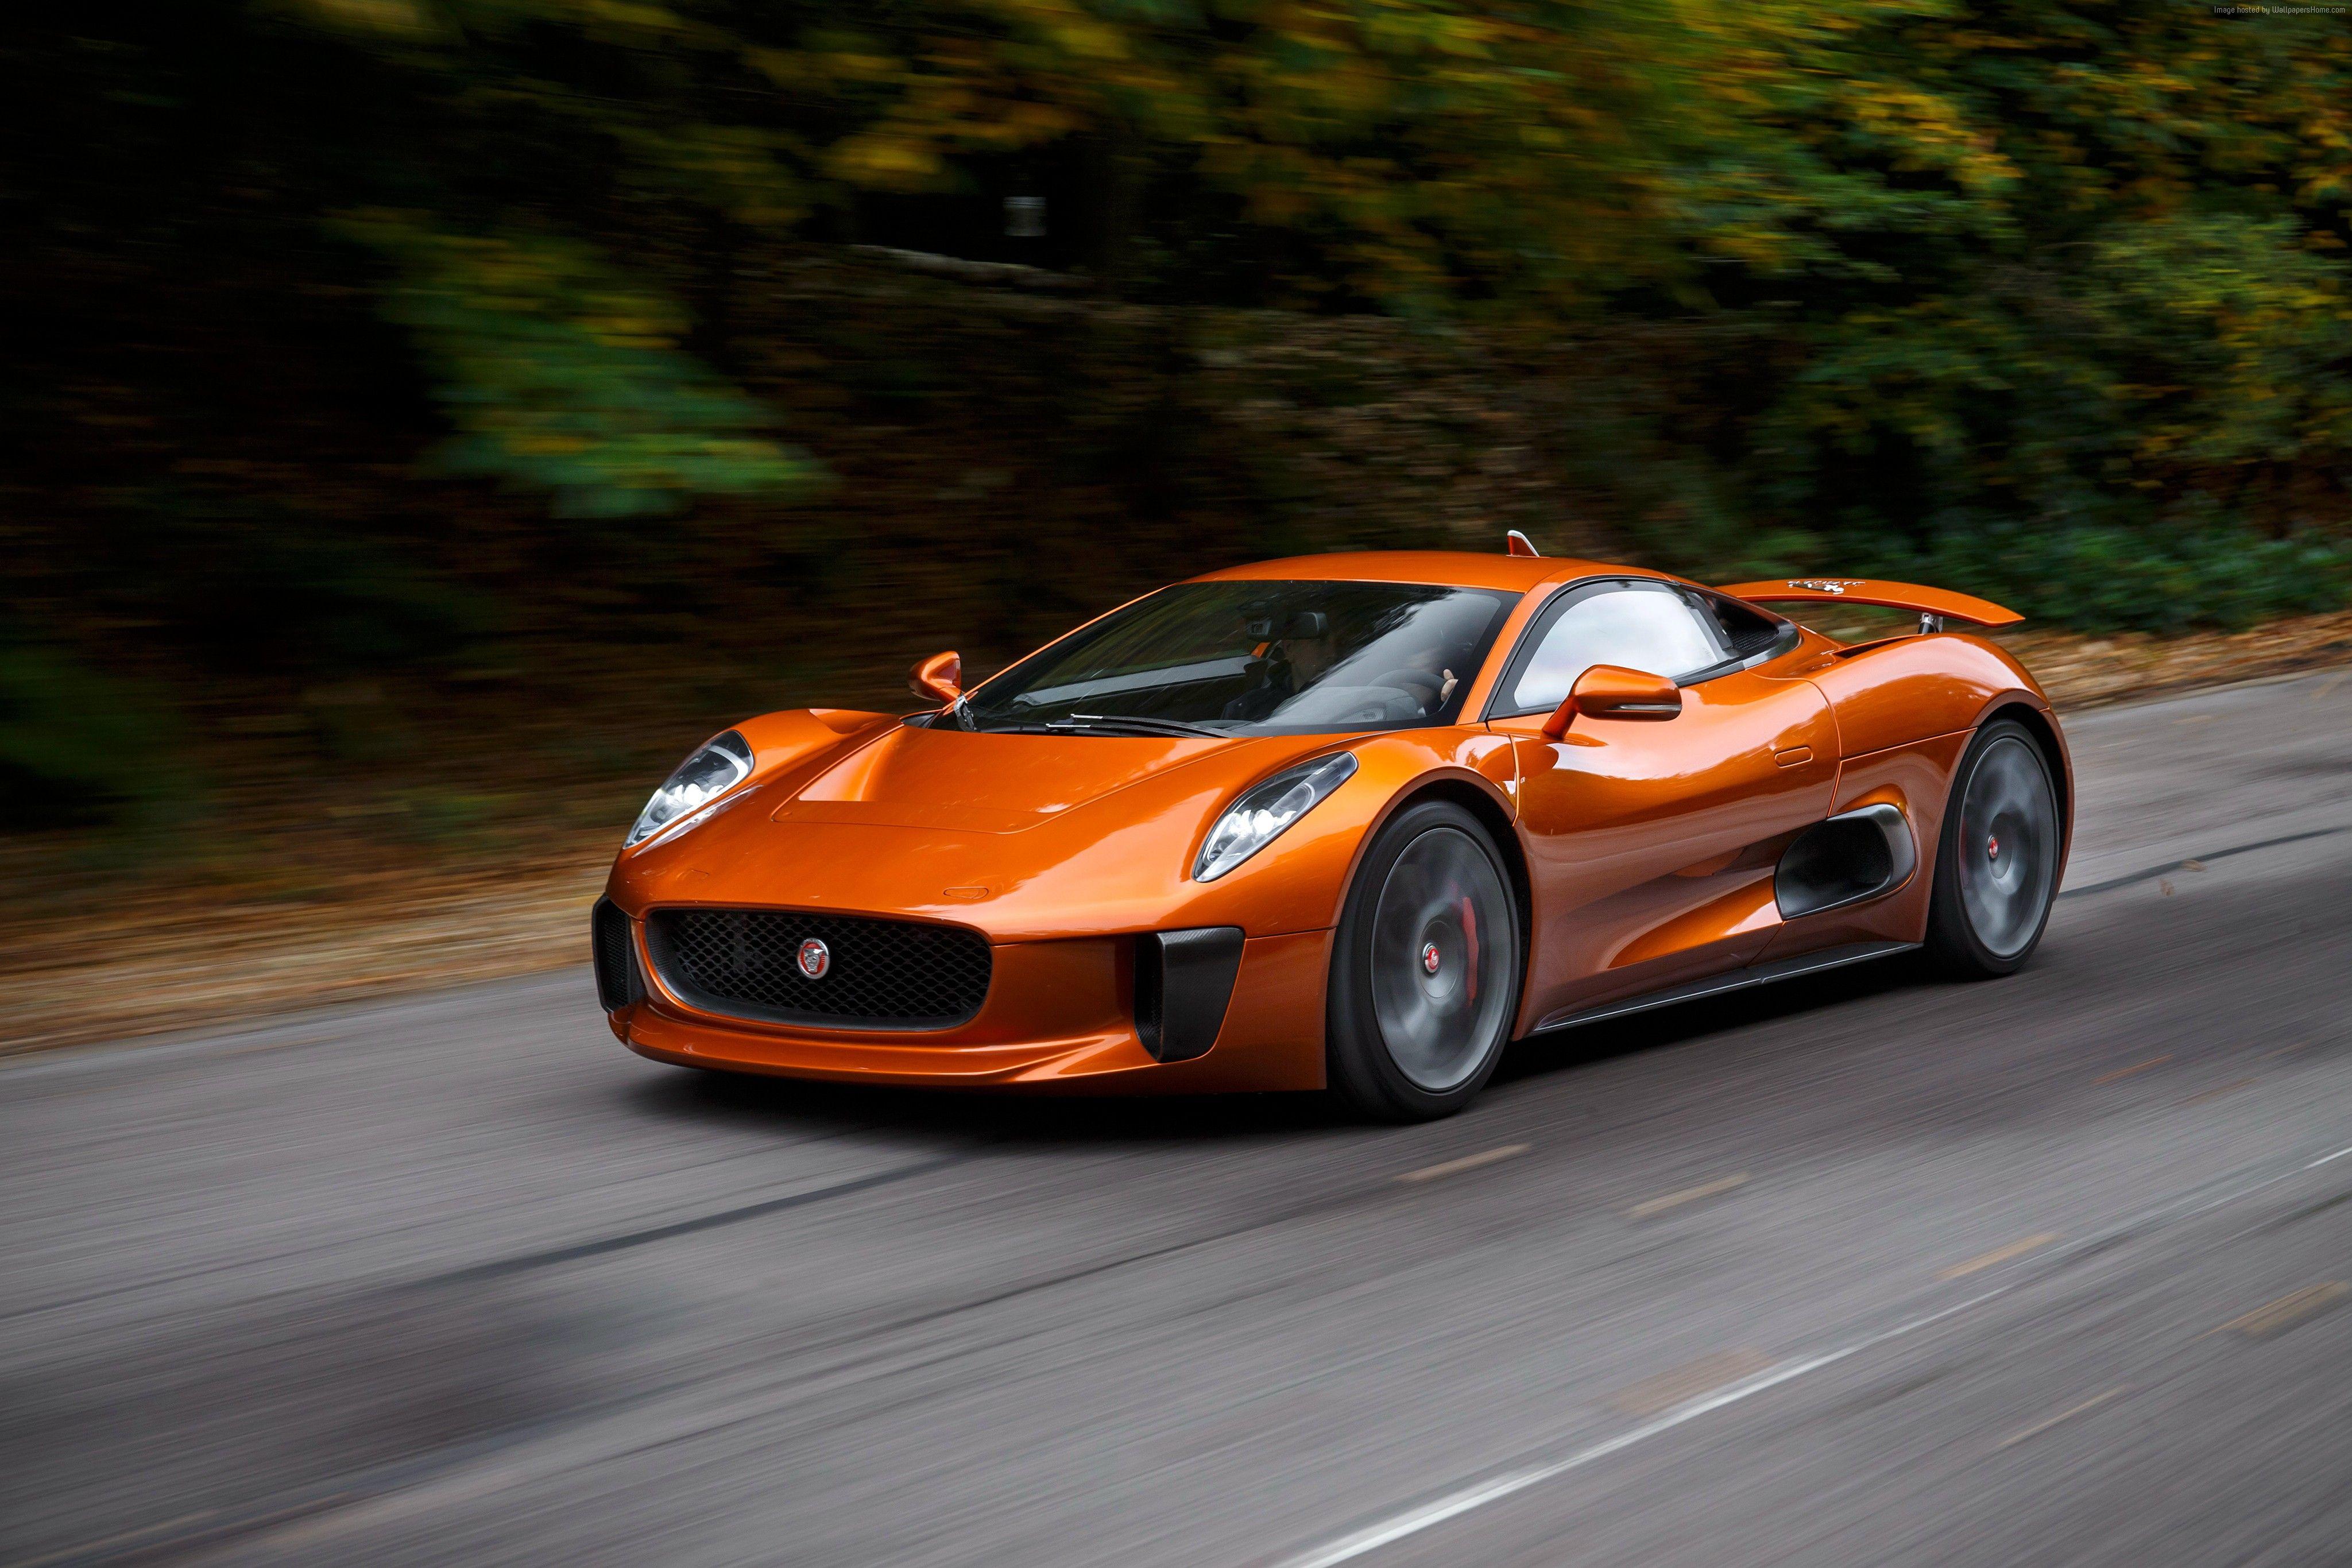 Jaguar C-X75 Gallery     SuperCars.net   British sports ...